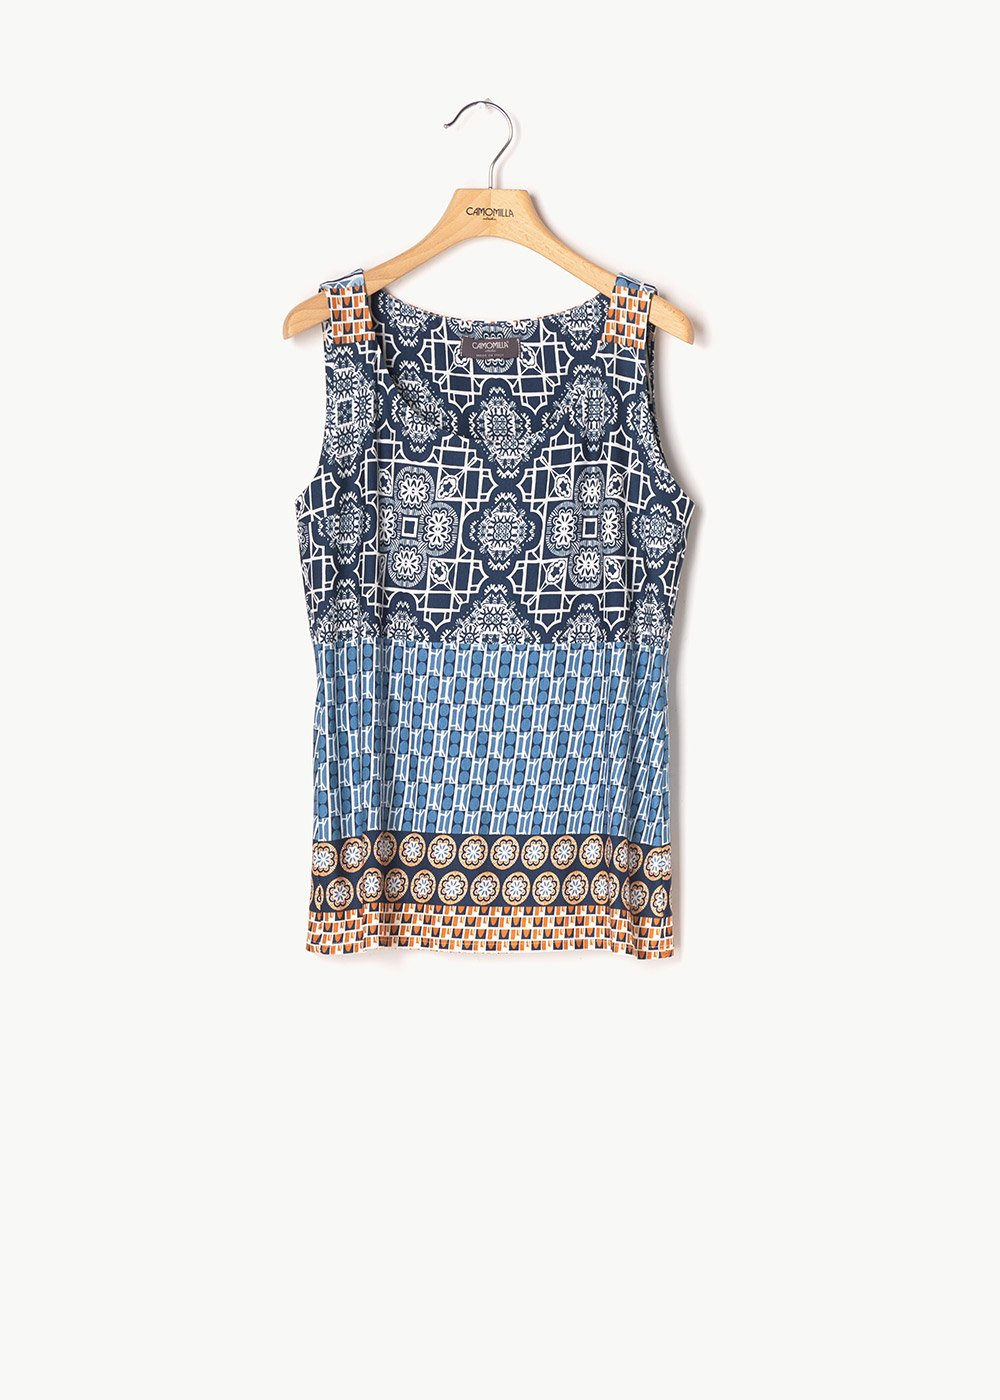 Rita sleeveless patterned top - Medium Blue \ Cacao - Woman